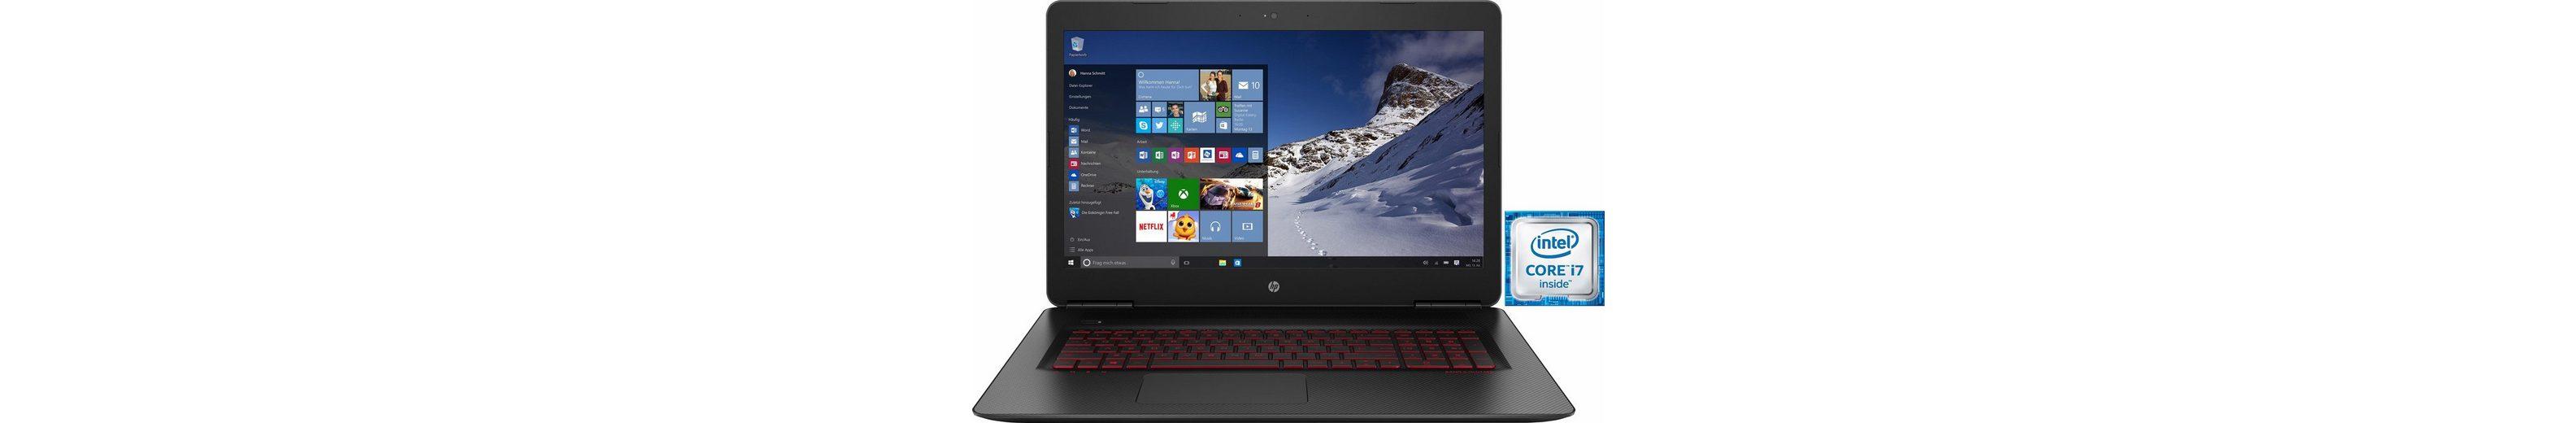 HP Omen 17-w006ng Notebook, Intel® Core™ i7, 43,9 cm (17,3 Zoll), 1128 GB Speicher